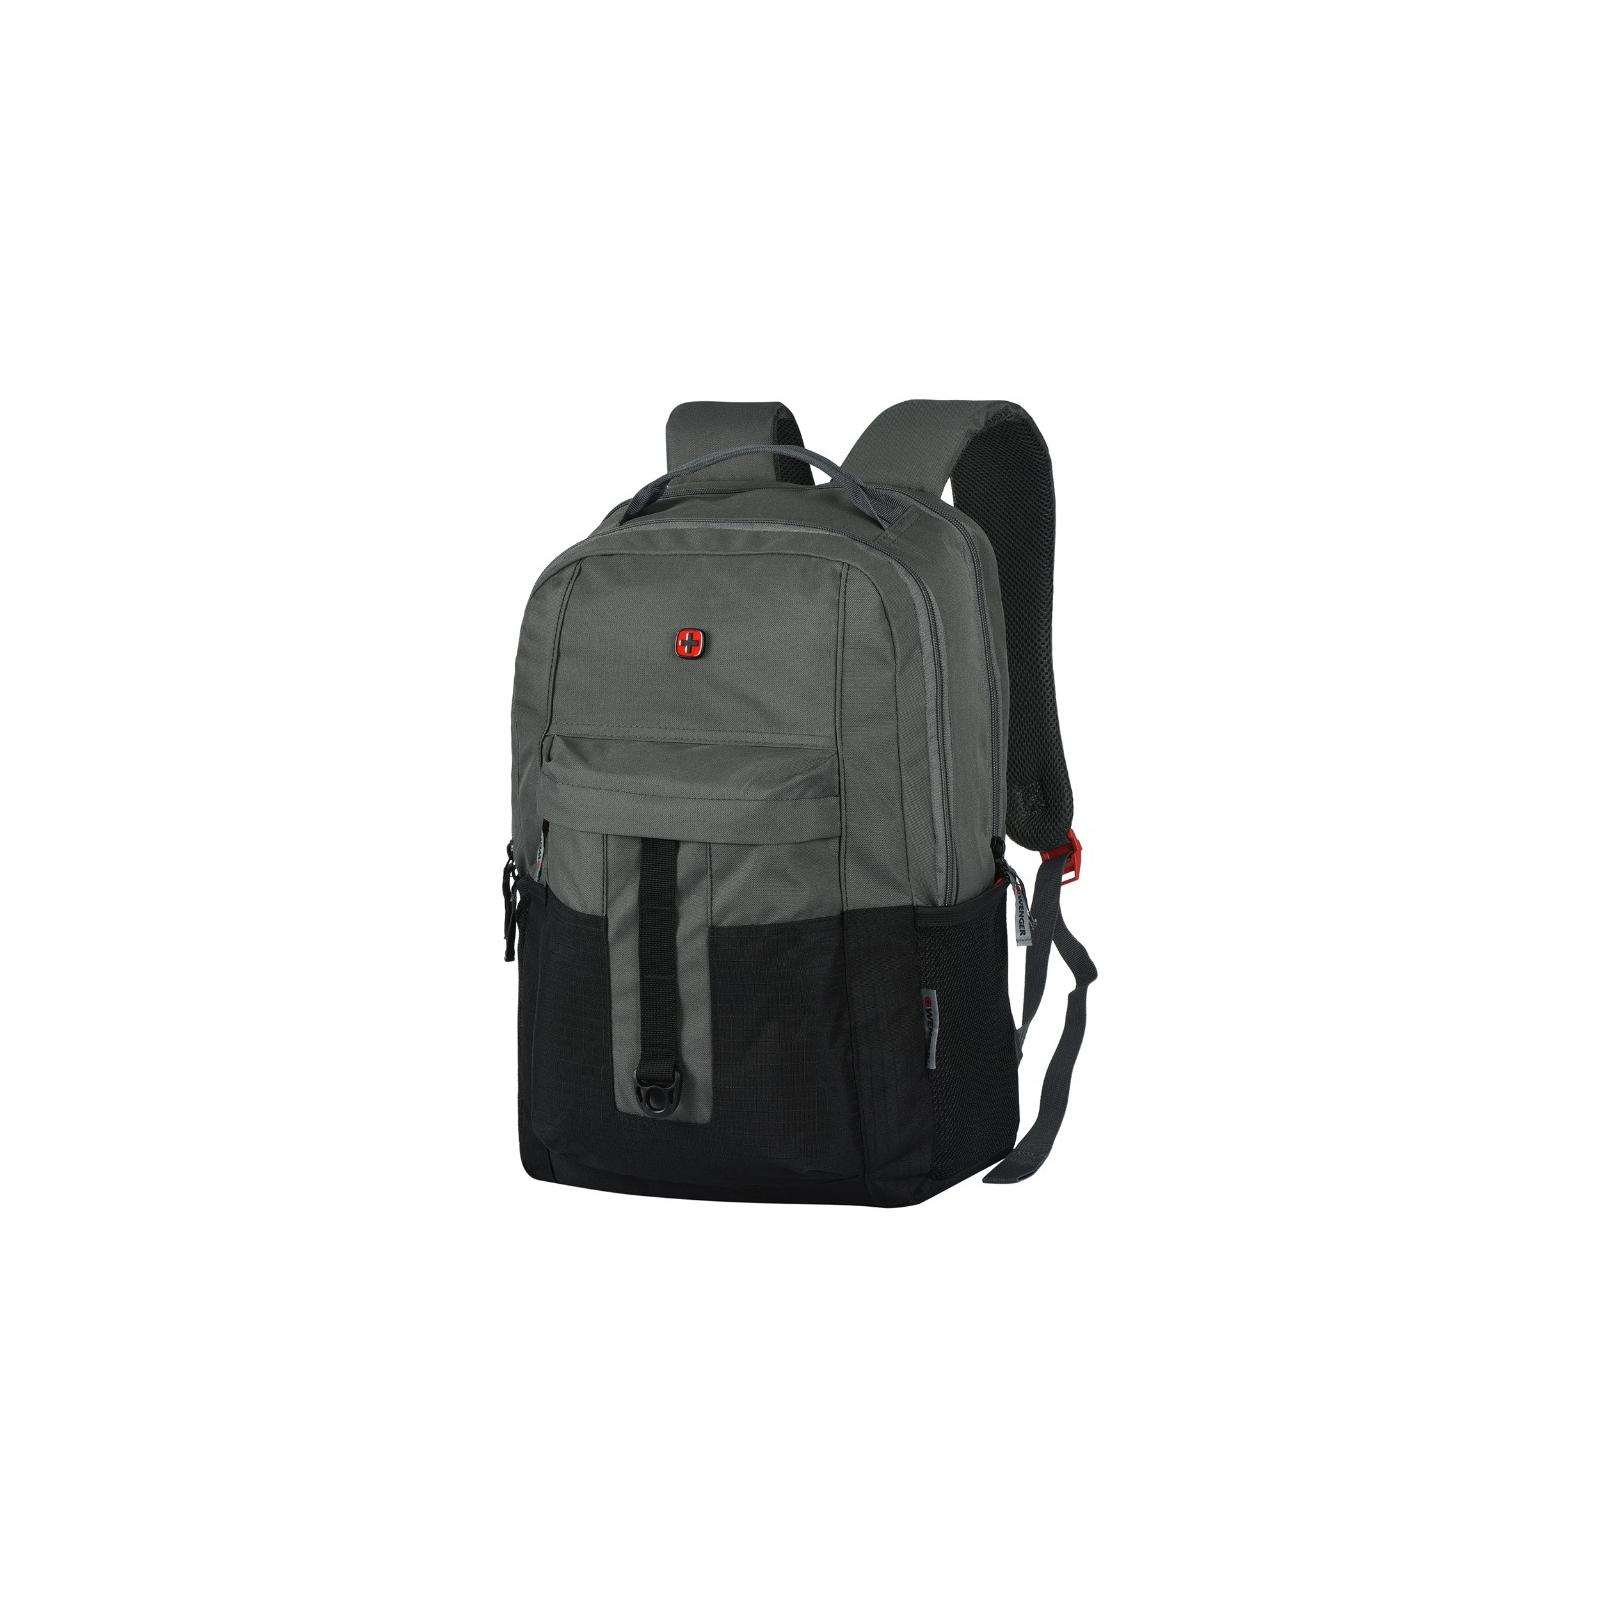 "Рюкзак для ноутбука Wenger 16"" Ero Black/Gray (604430)"